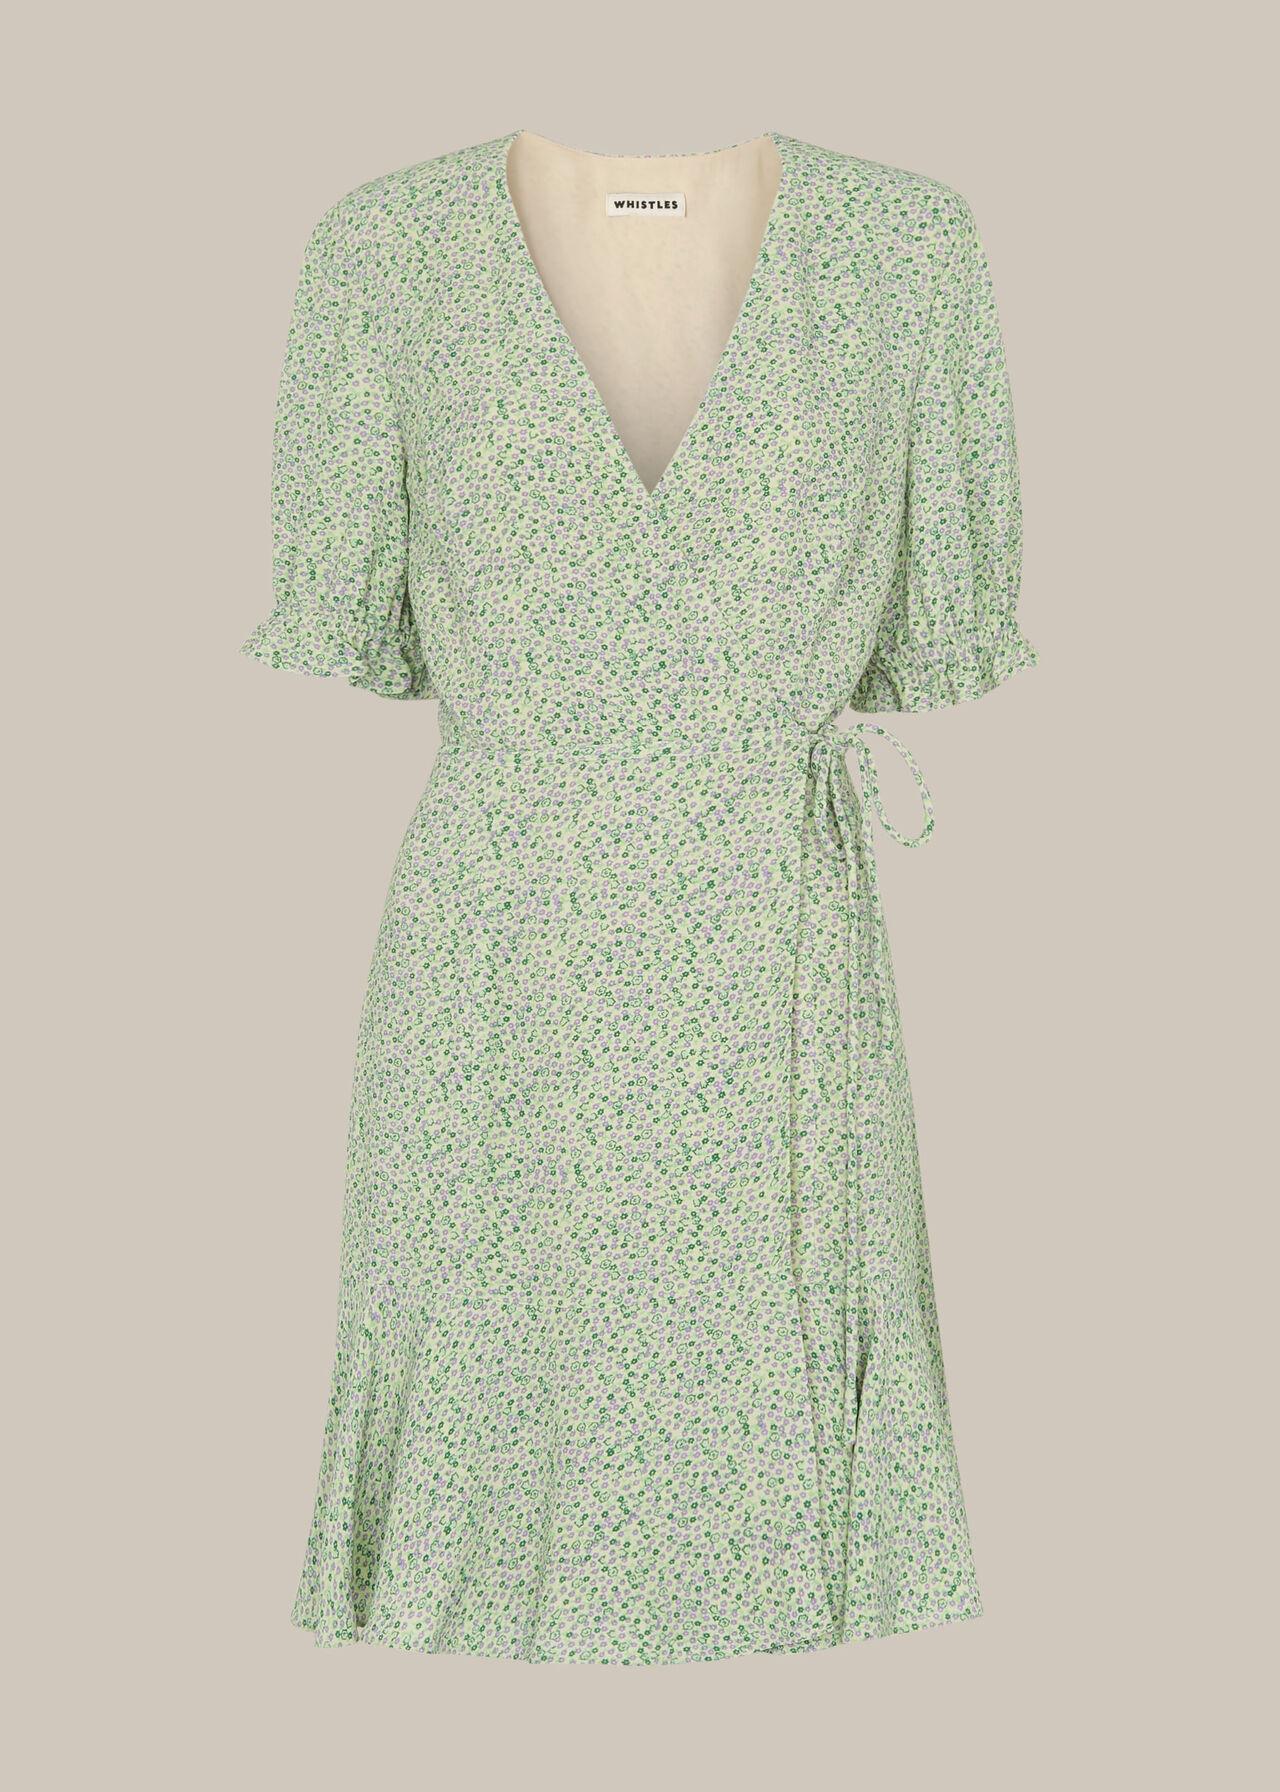 English Garden Wrap Dress Green/Multi